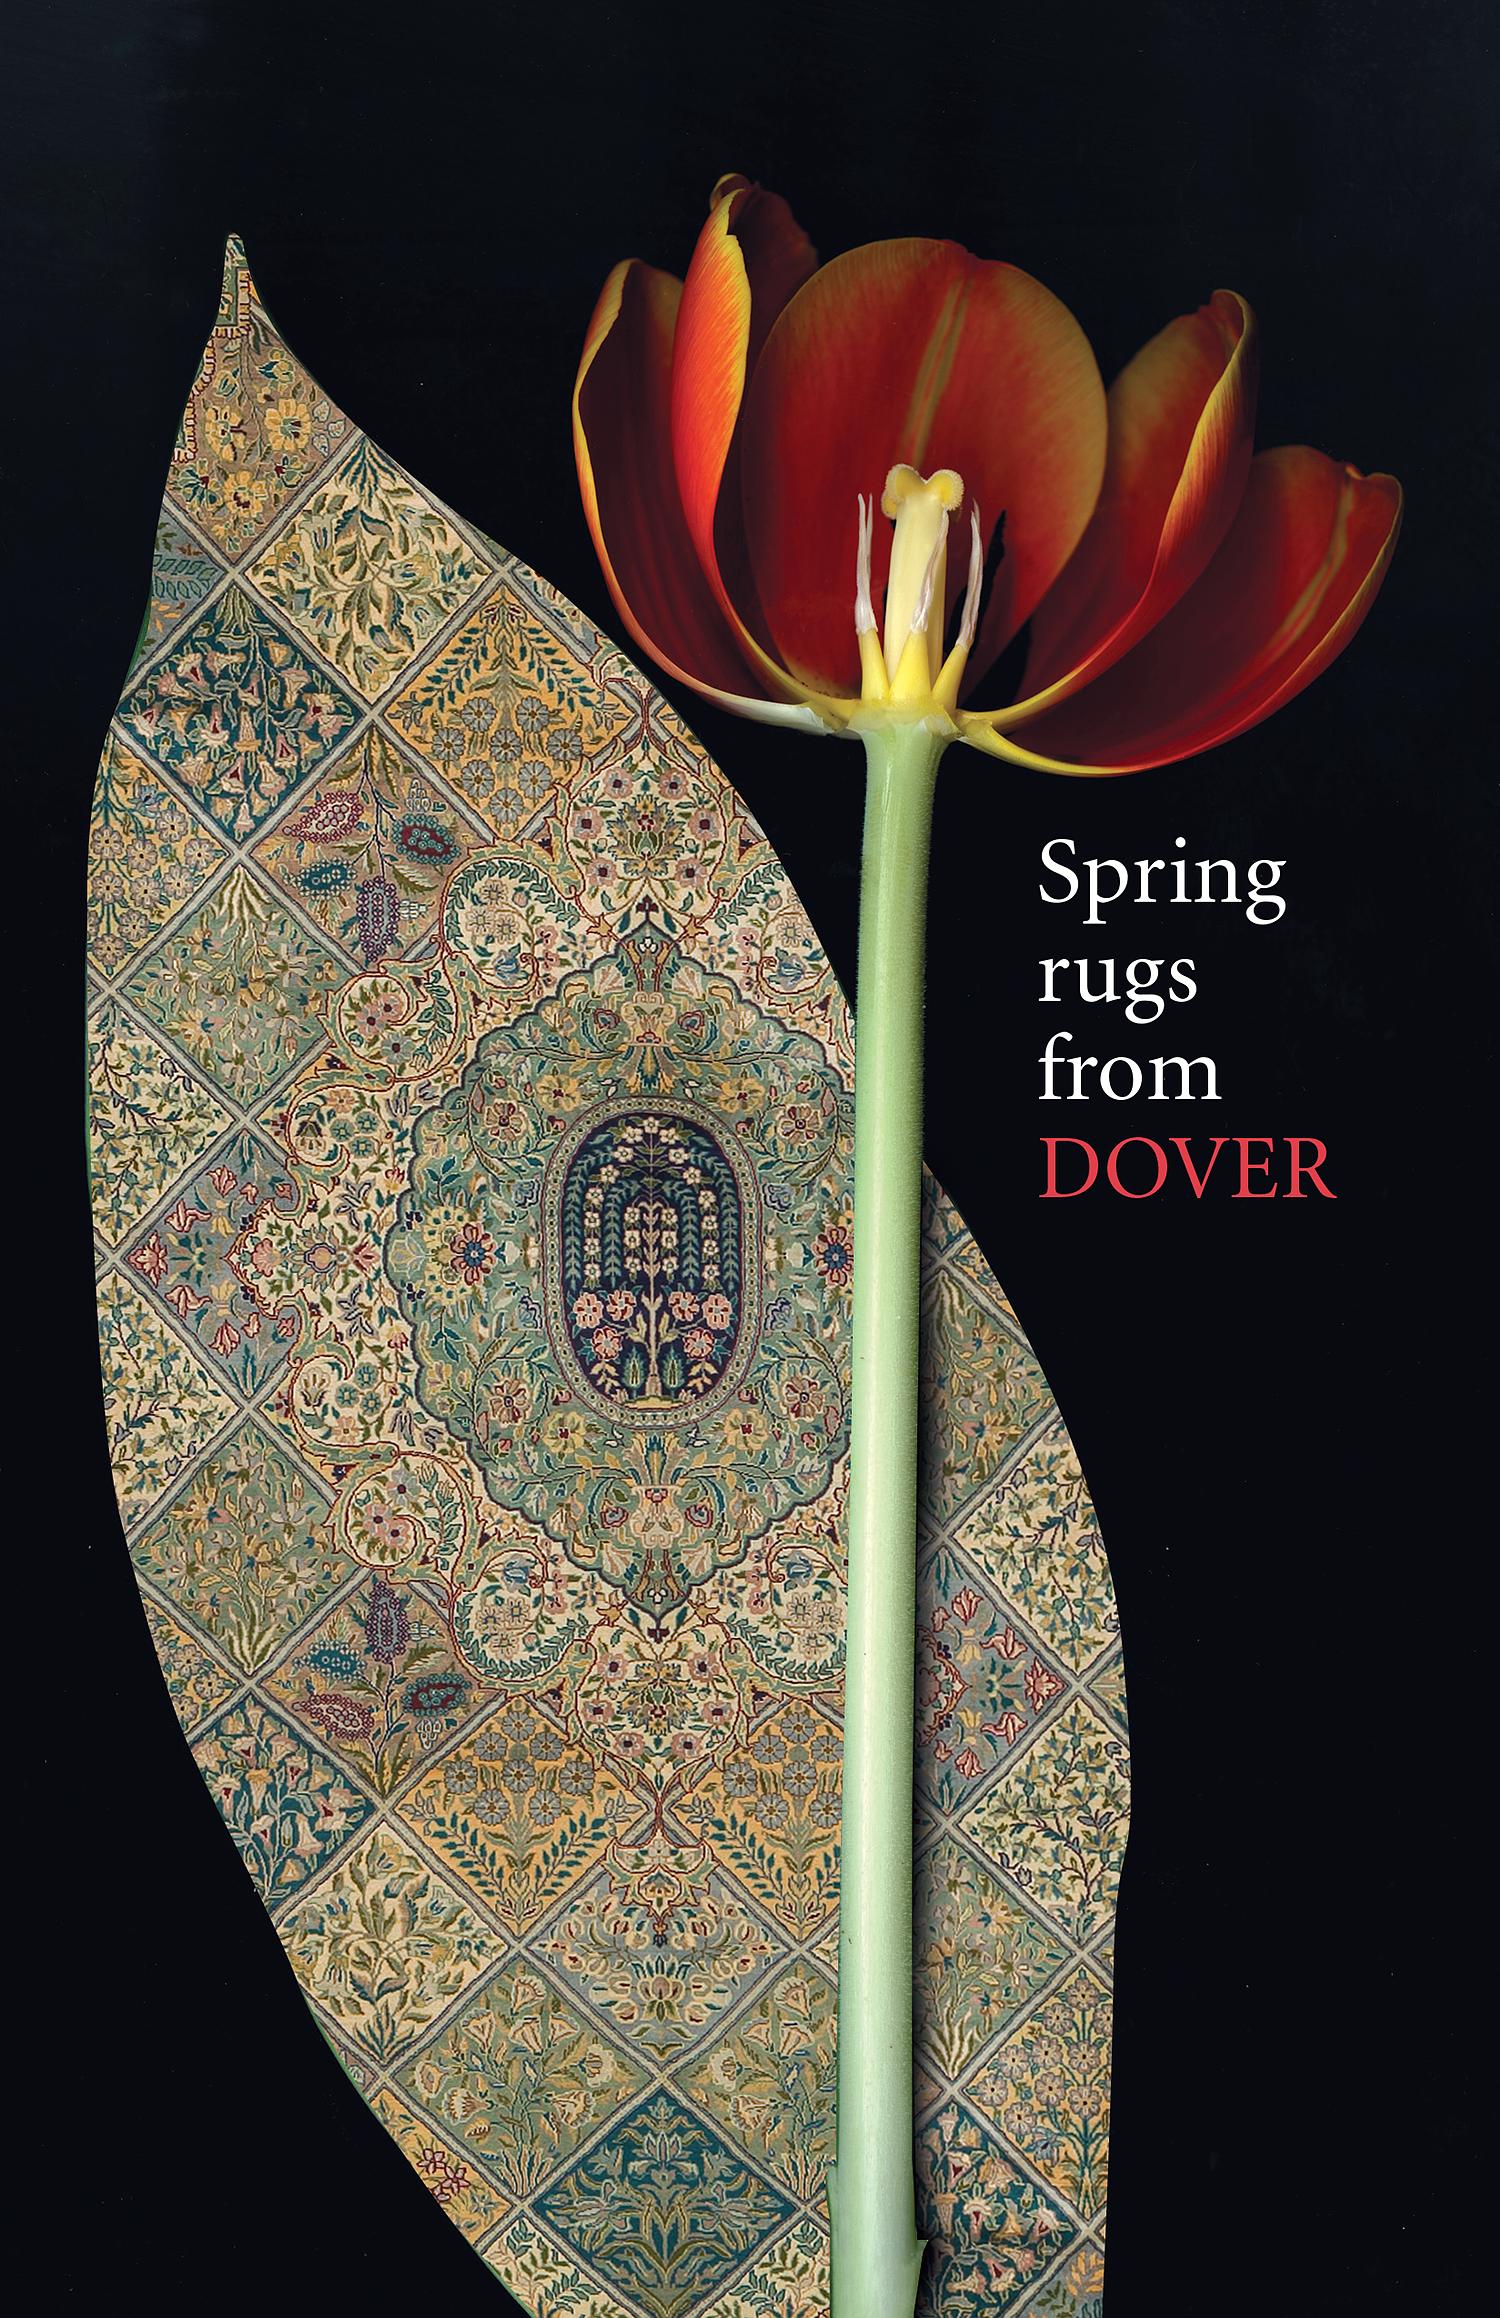 Dover_SpringAd#01 copy.png